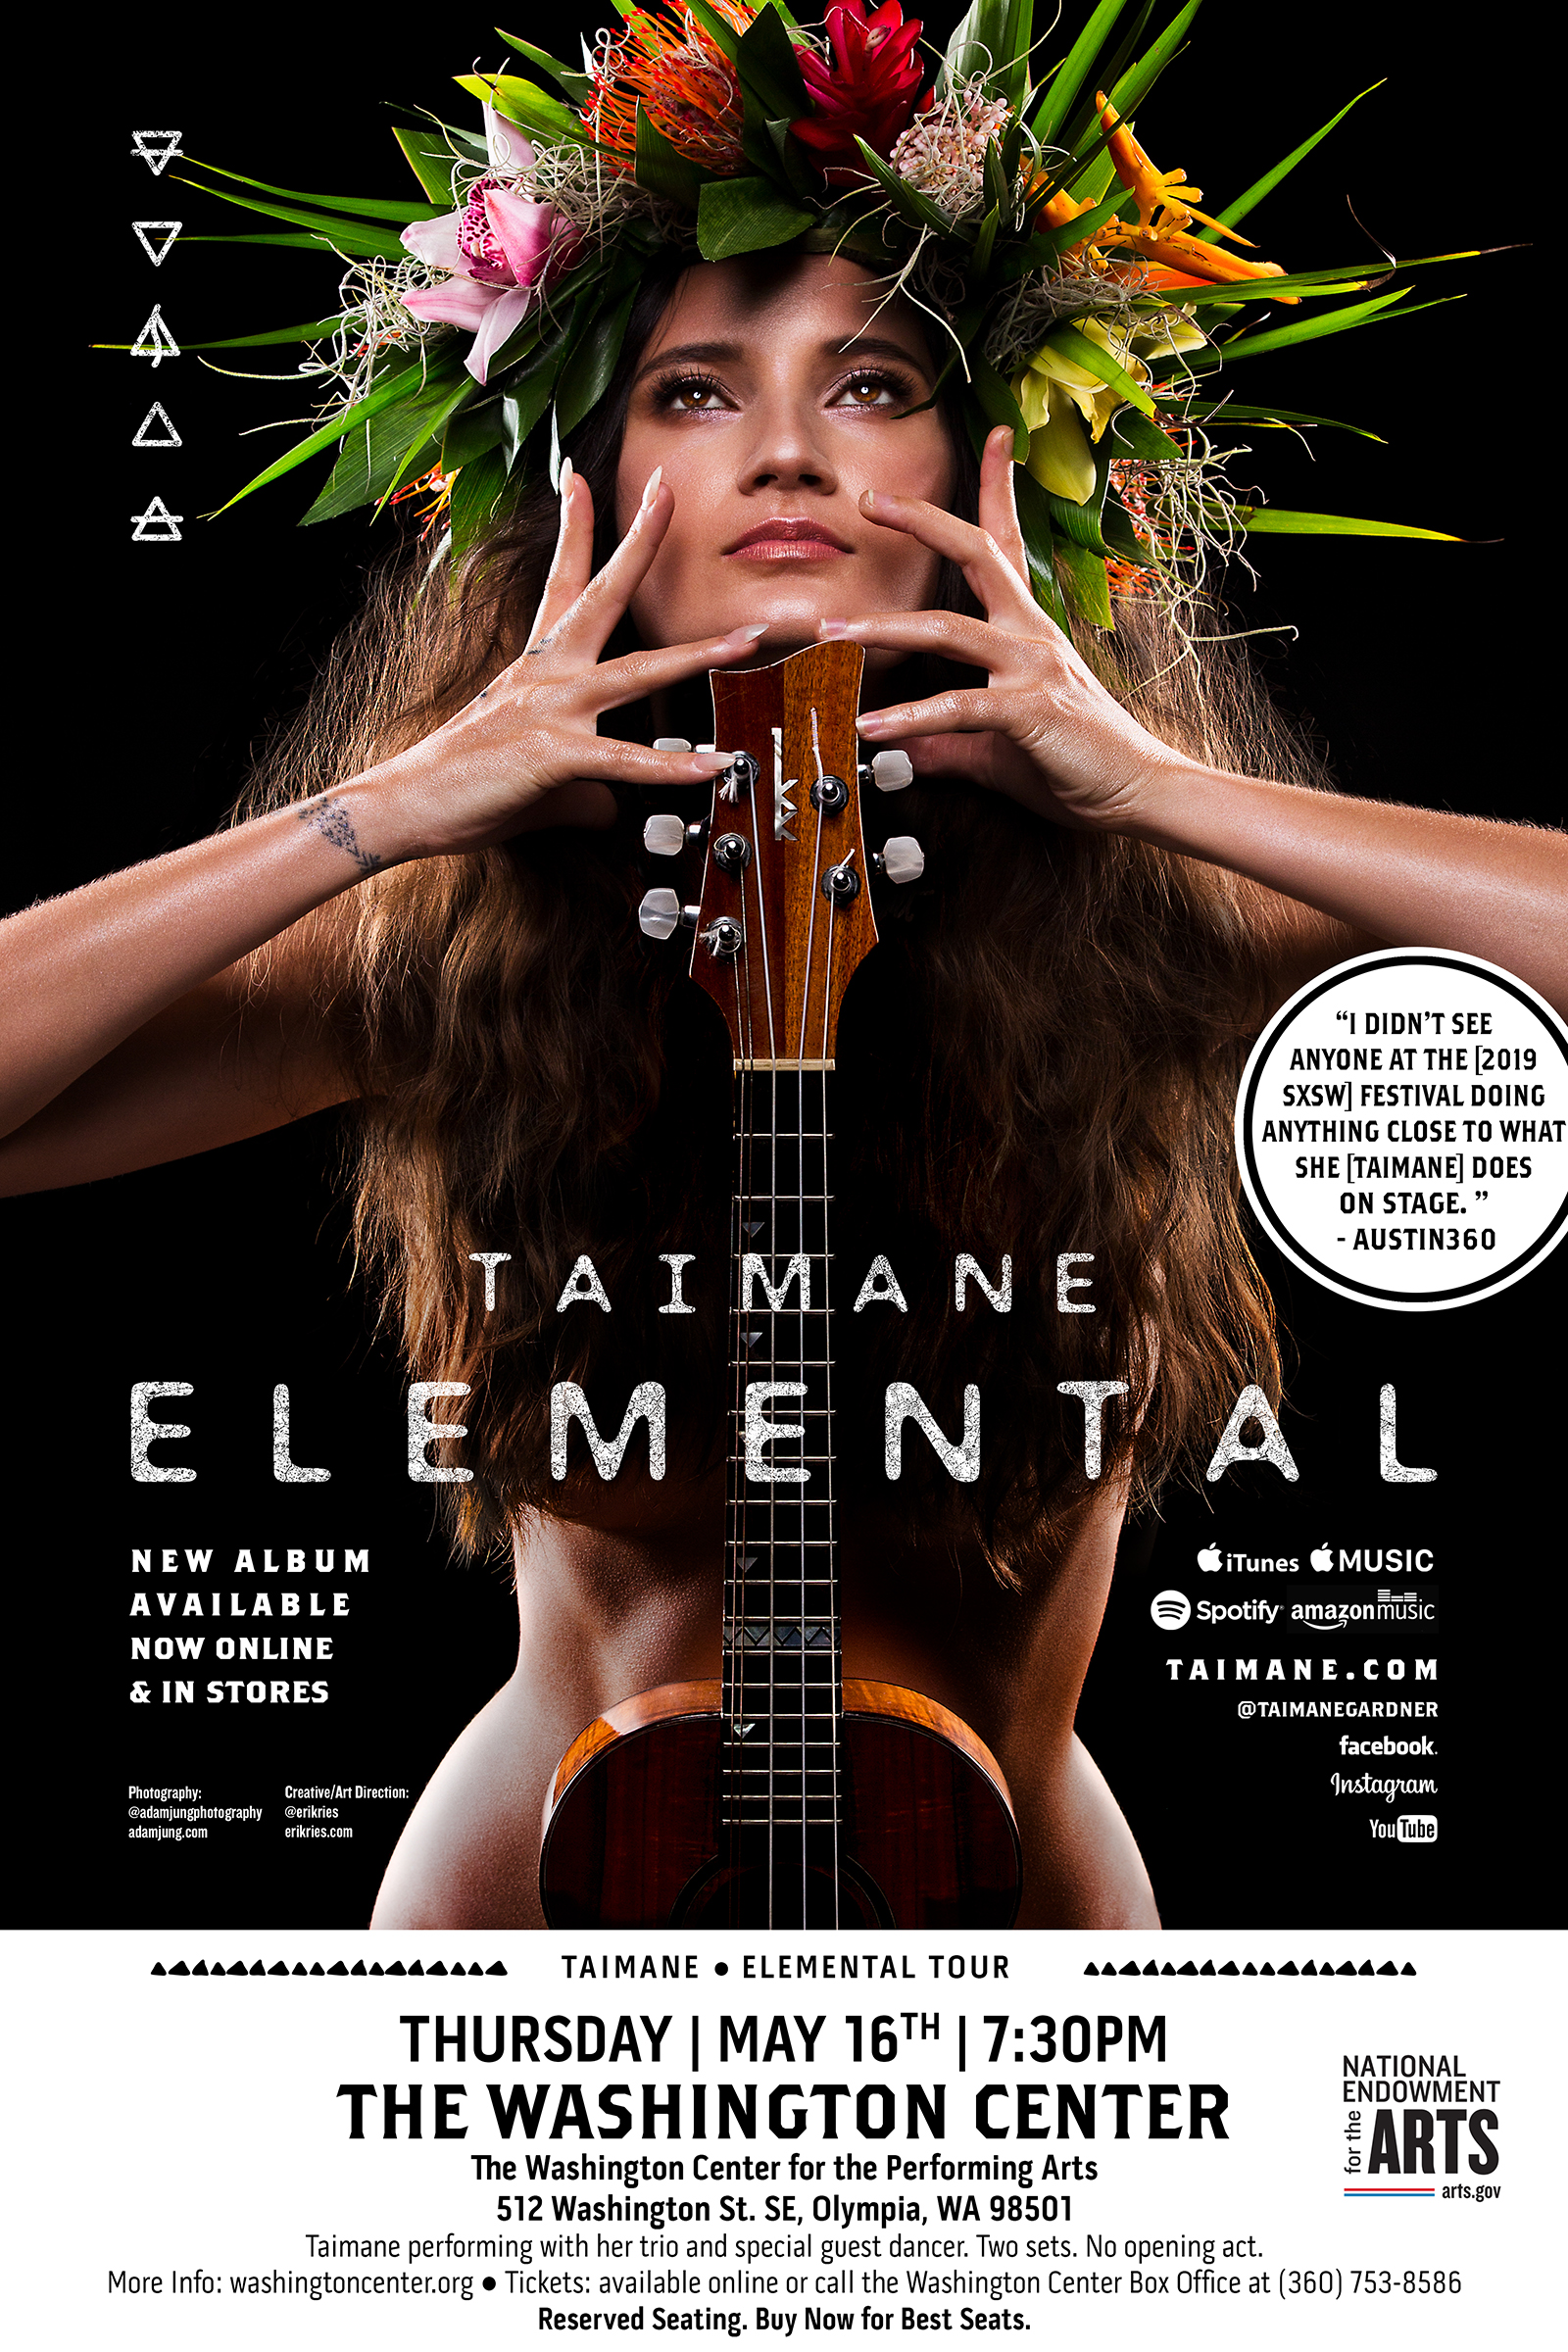 Taimane Elemental 24x36 - Washington Center_lr1600x2400.jpg